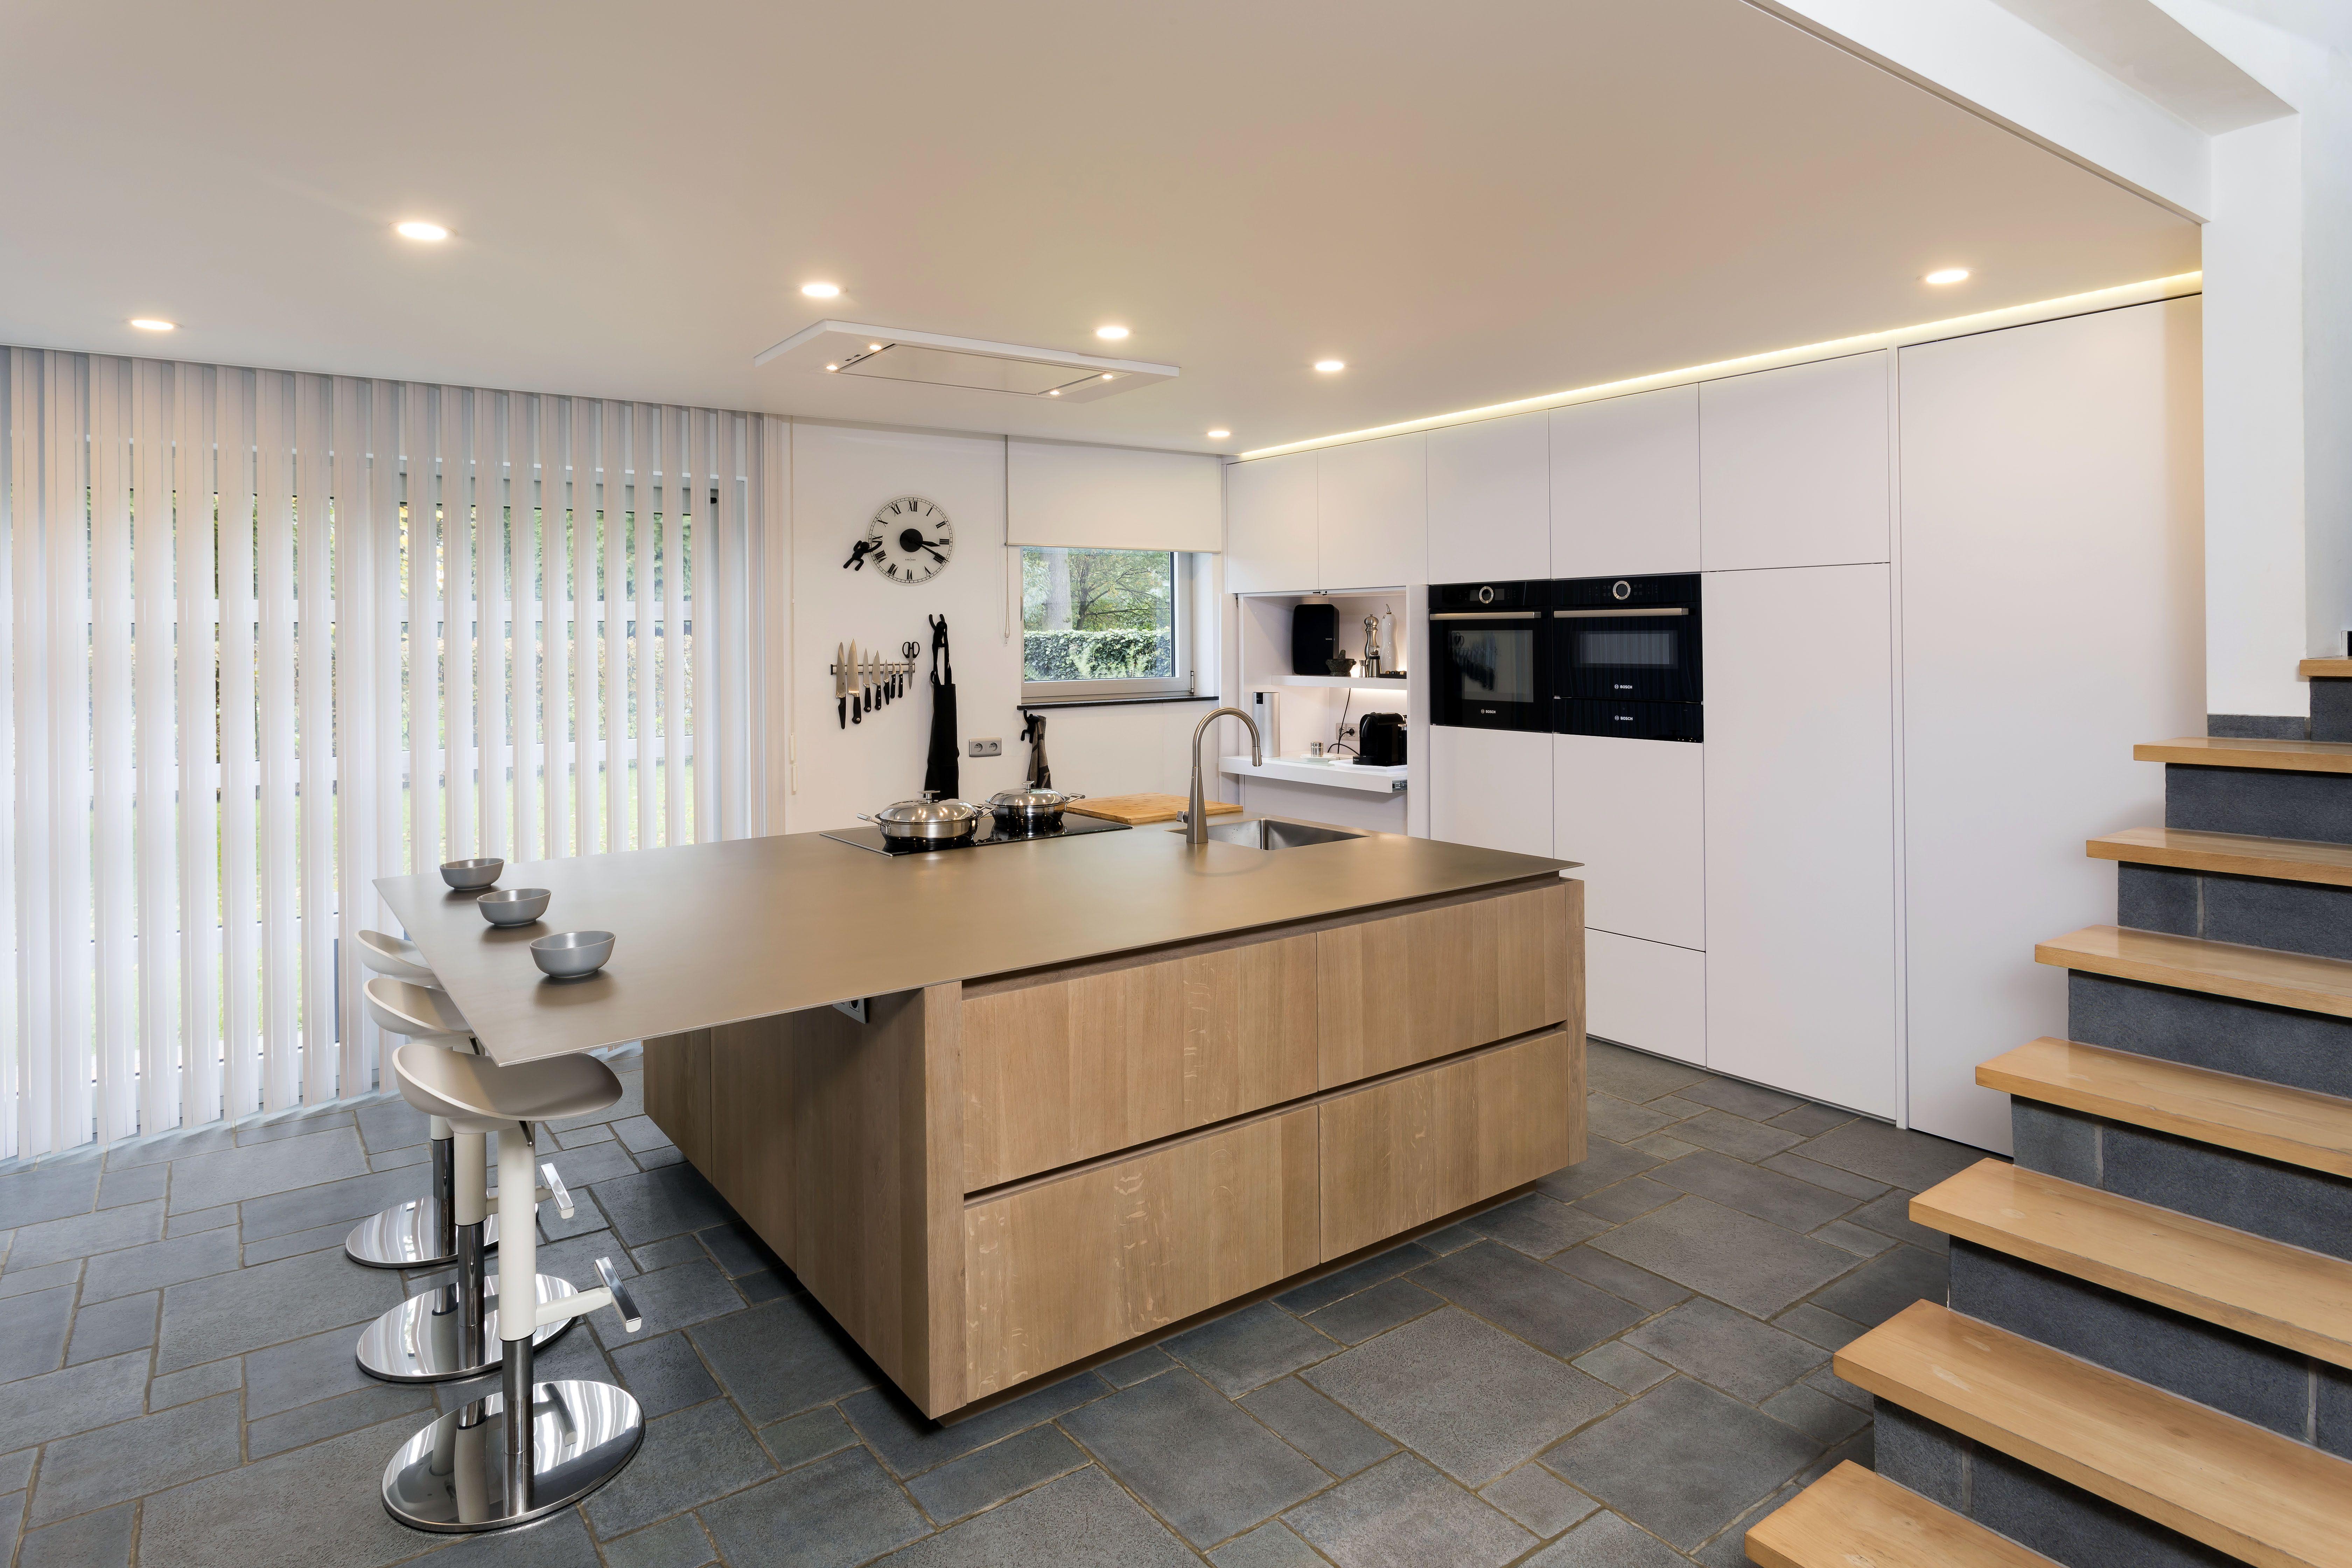 Franssen Keukens Design : Franssen keukens design en luxe keuken design luxe keukens